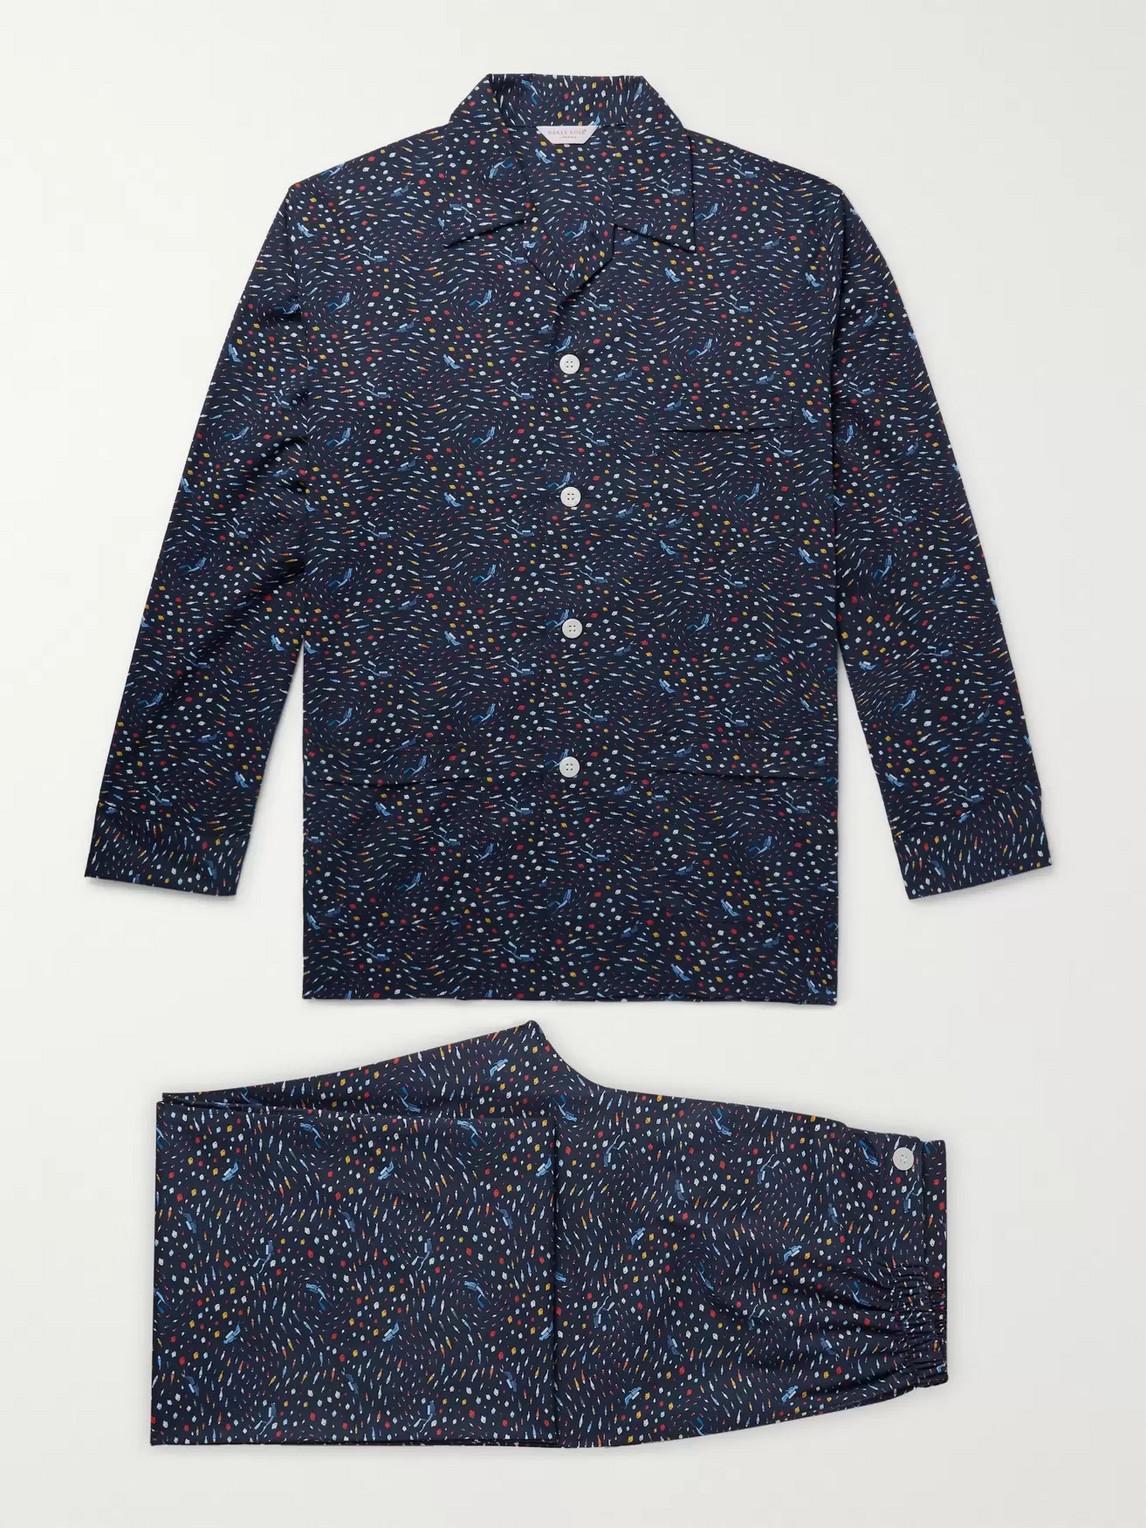 derek rose - ledbury printed cotton-poplin pyjama set - blue - s - men